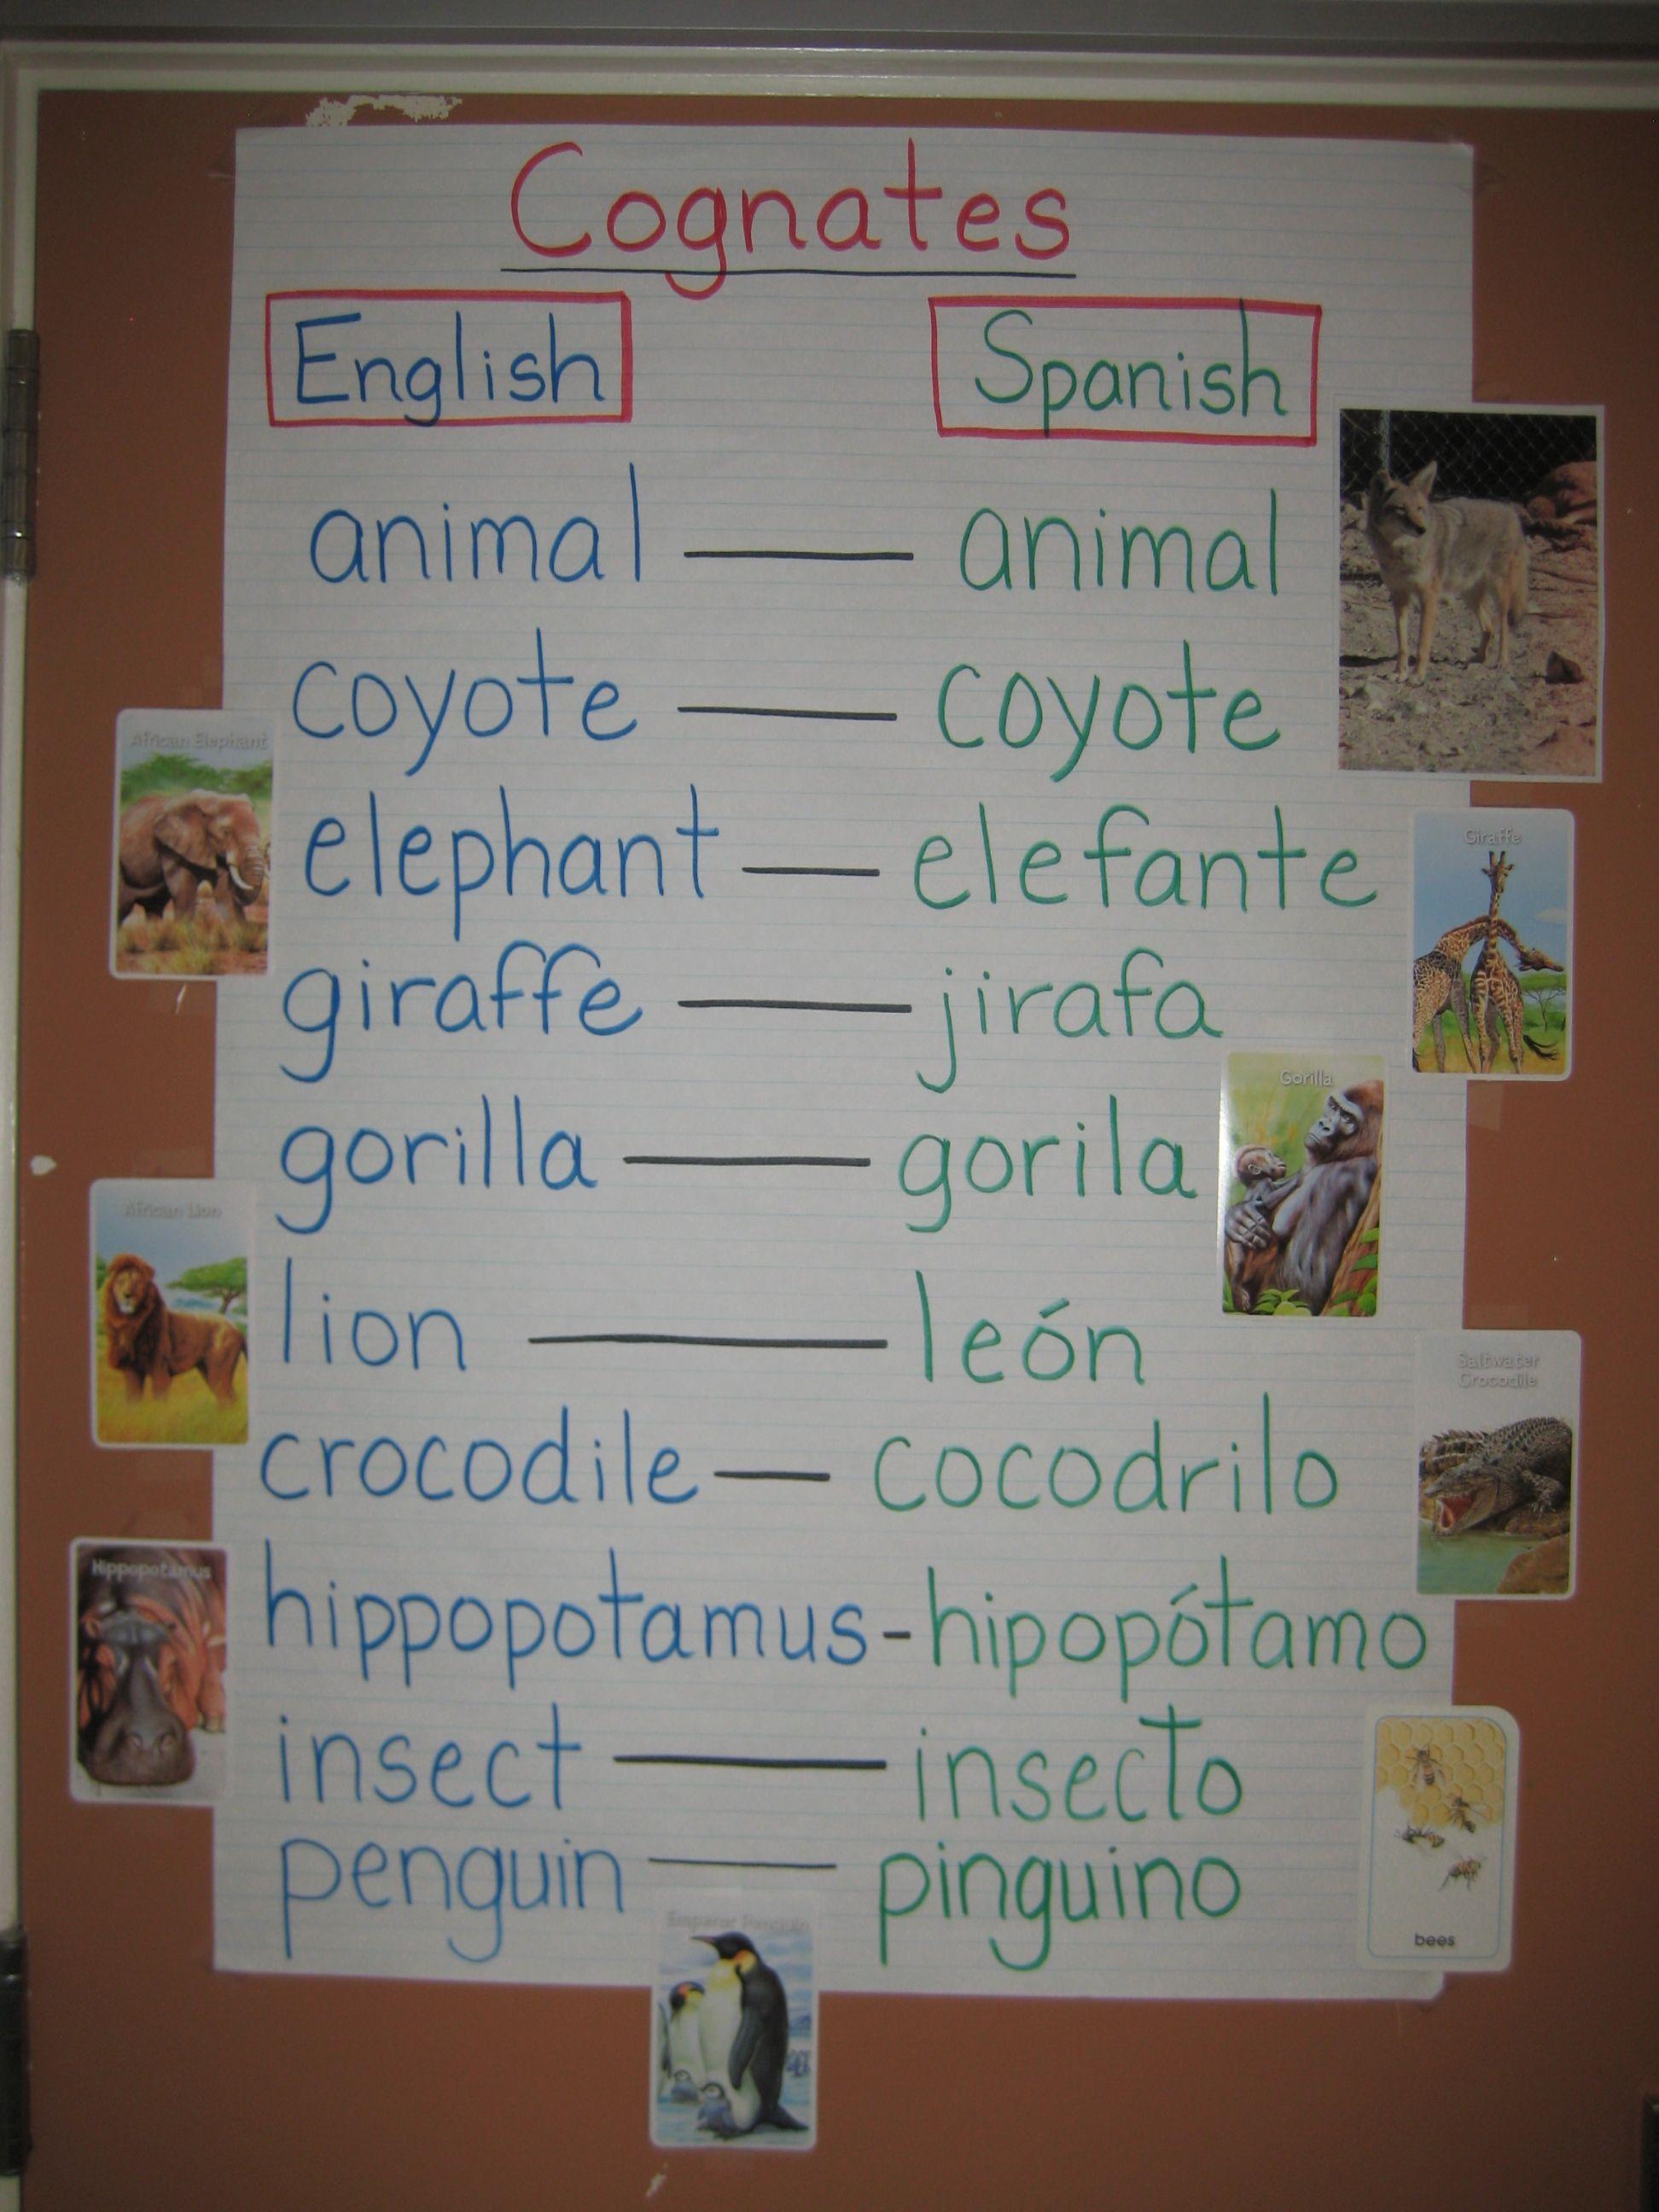 Cognates Help With Vocabulary Development Mary Wallis